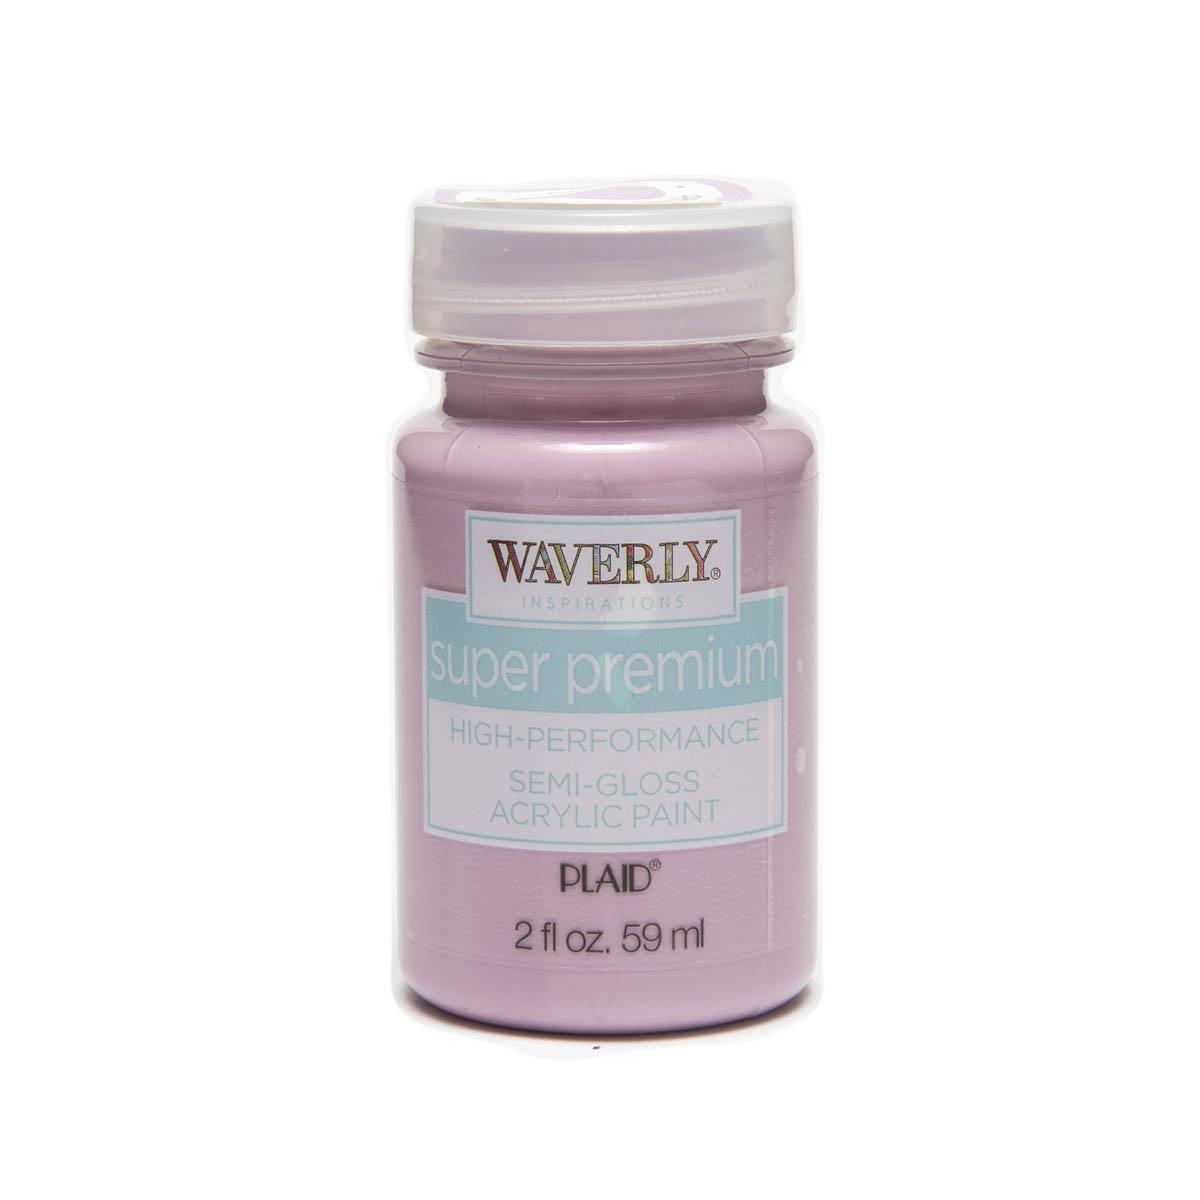 Waverly ® Inspirations Super Premium Semi-Gloss Acrylic Paint - Orchid, 2 oz.